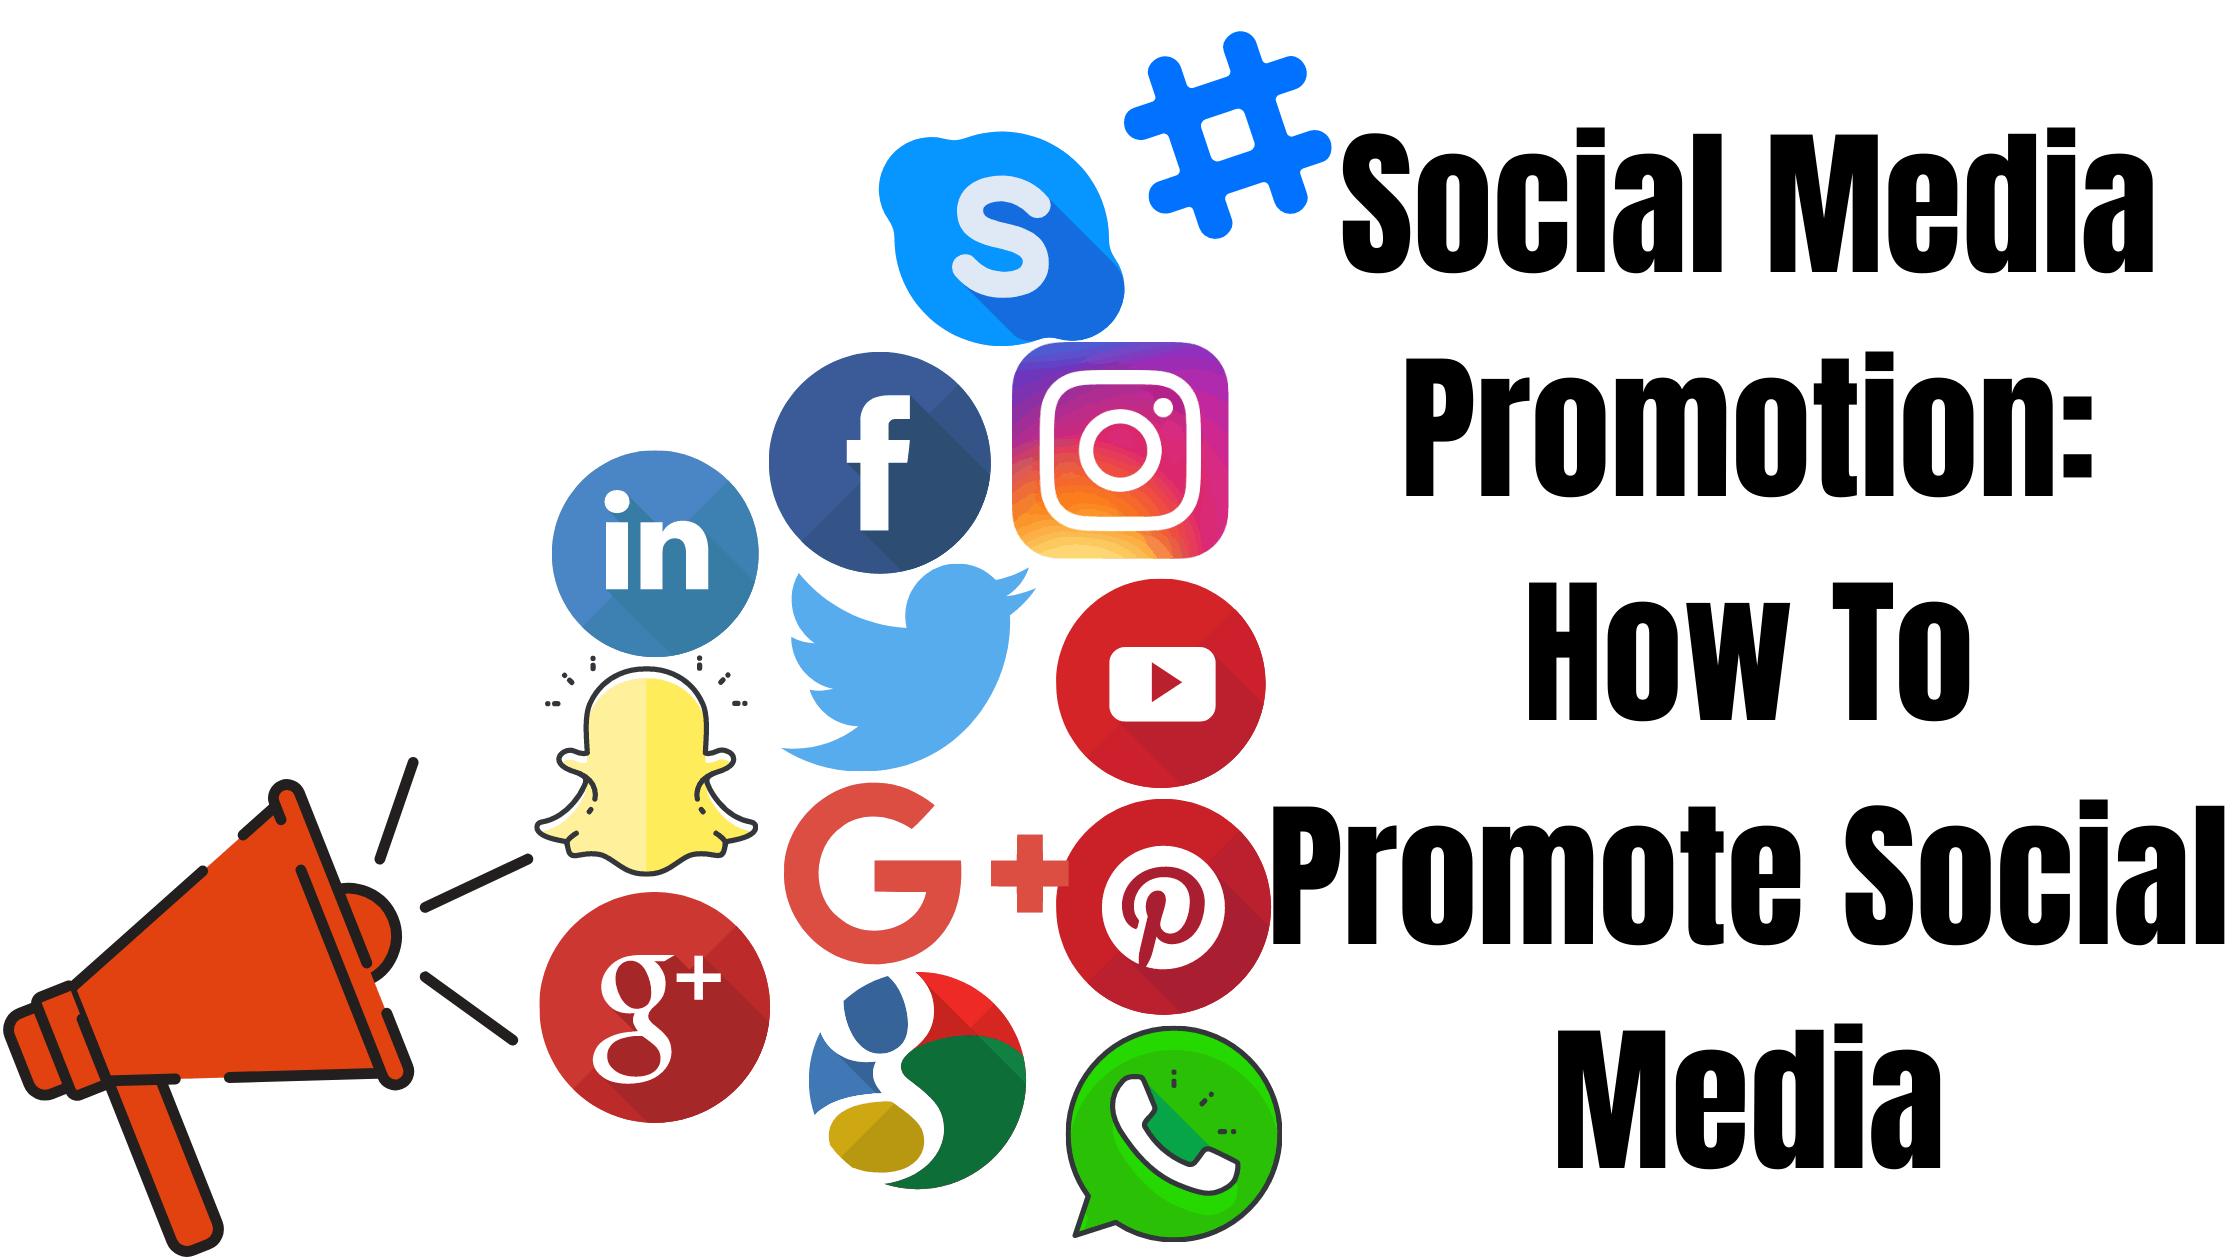 Social Media Promotion: How To Promote Social Media 1